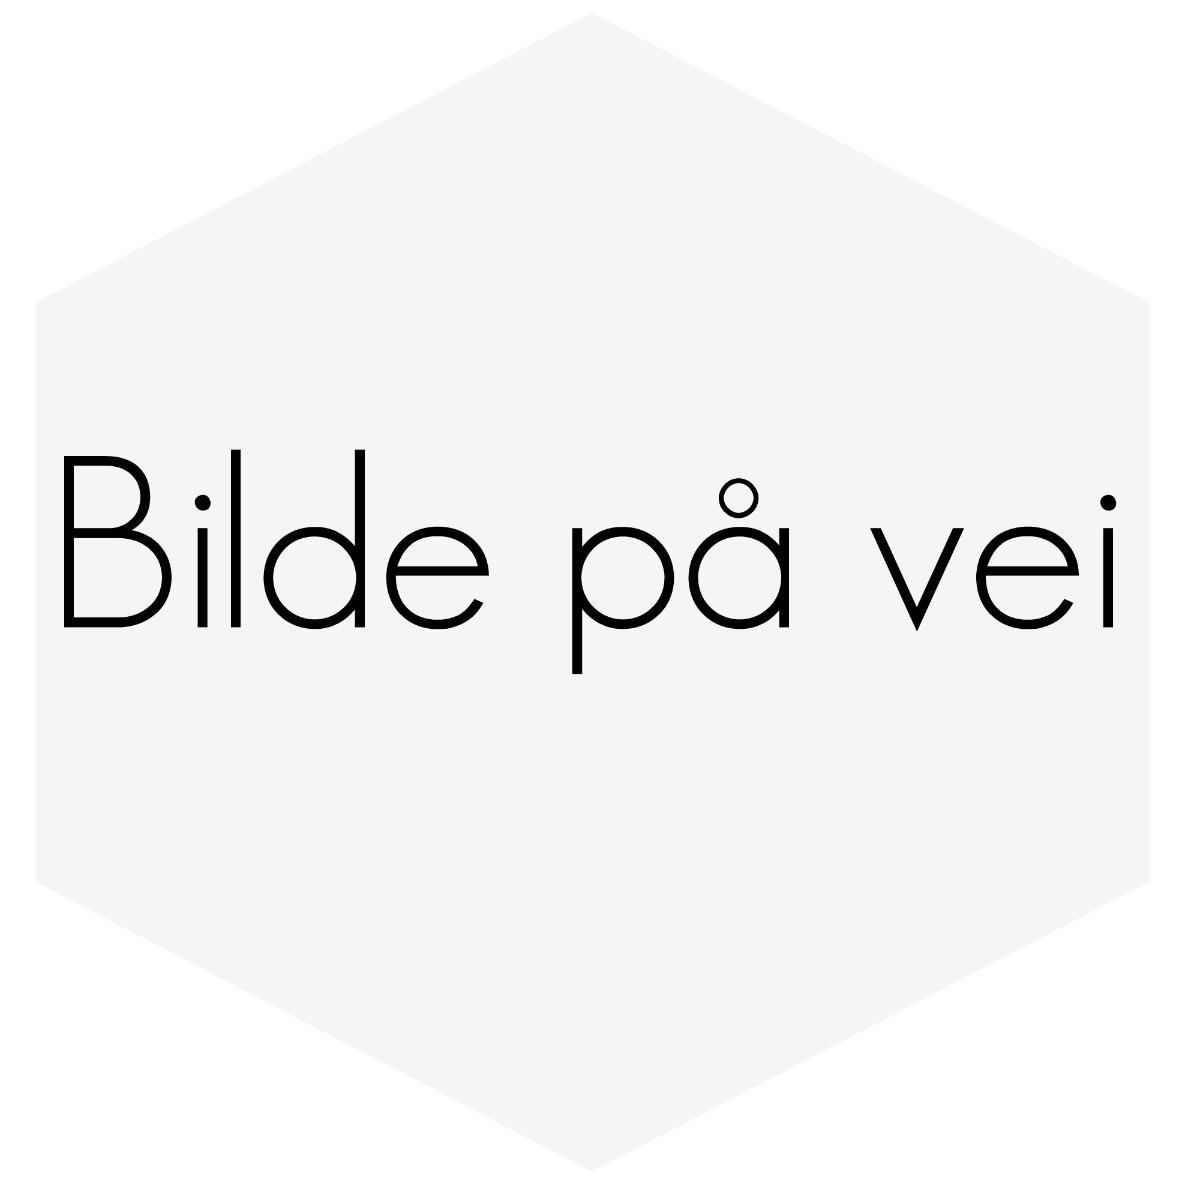 BREMSECALIPER FORAN H.S VOLVO S60, V70N, S80 8601559, 8602677